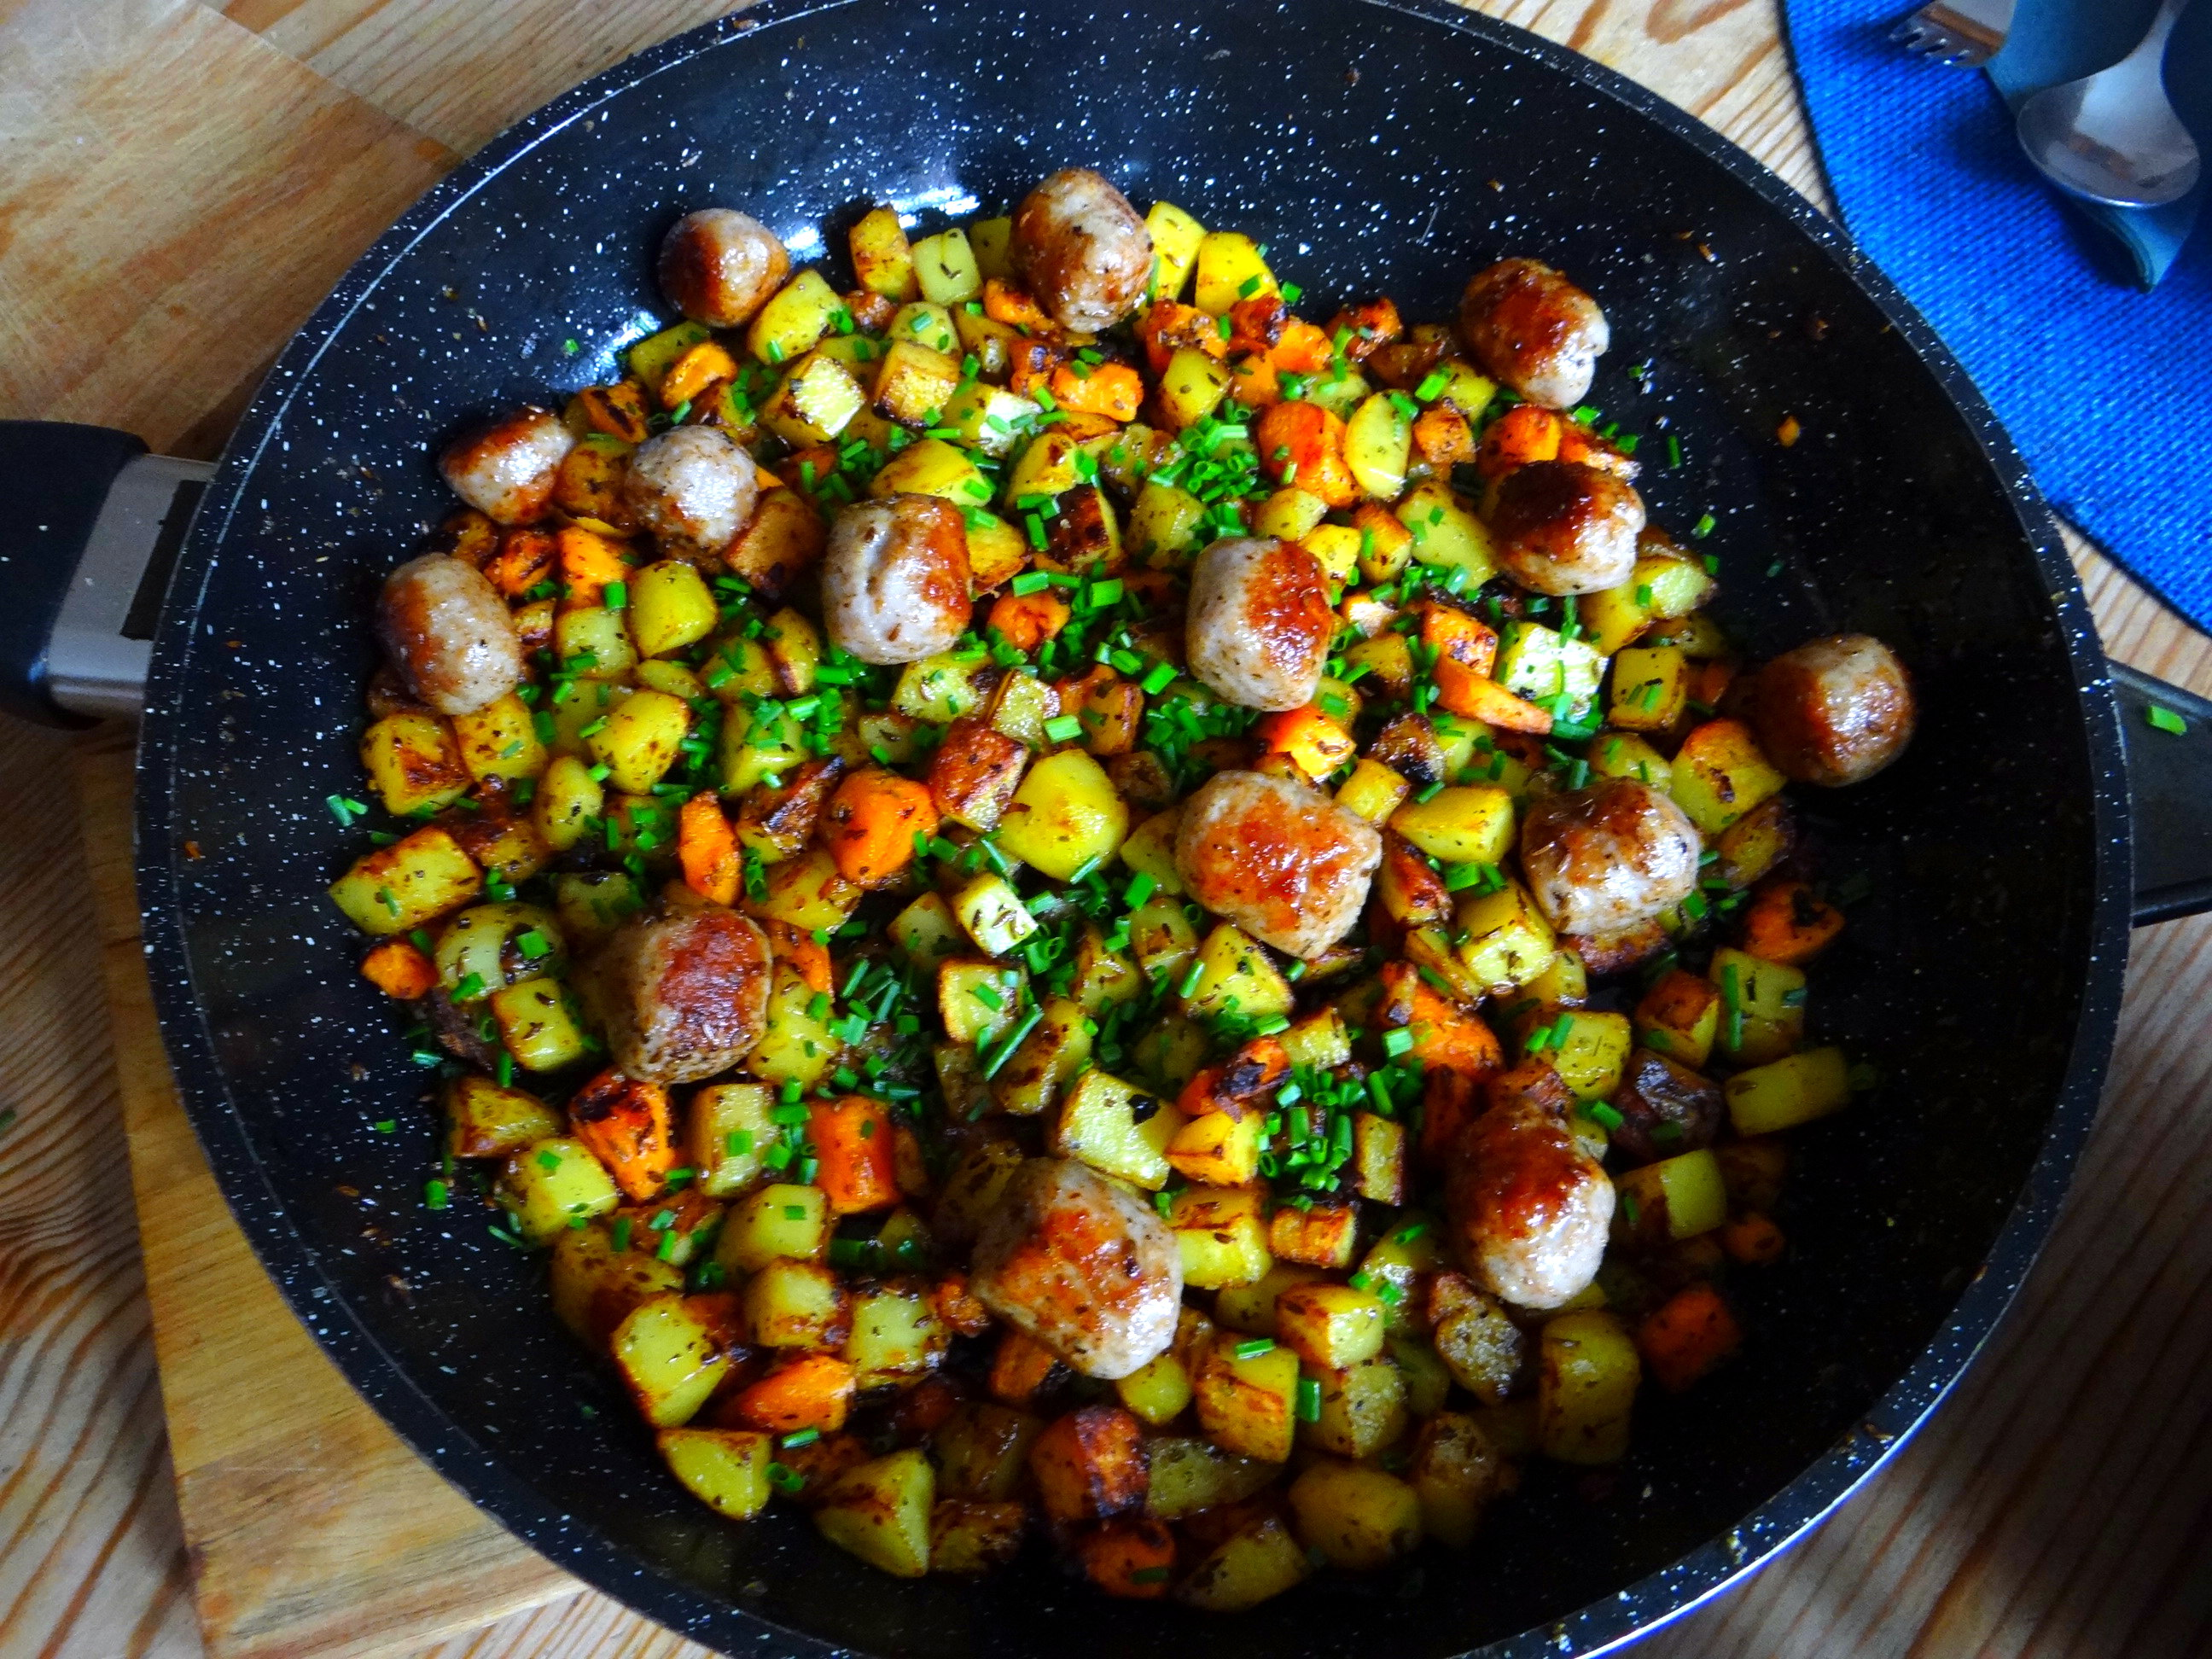 Rohgebratene Kartoffeln,Hackbällchen,Dip,Feldsalat (9)